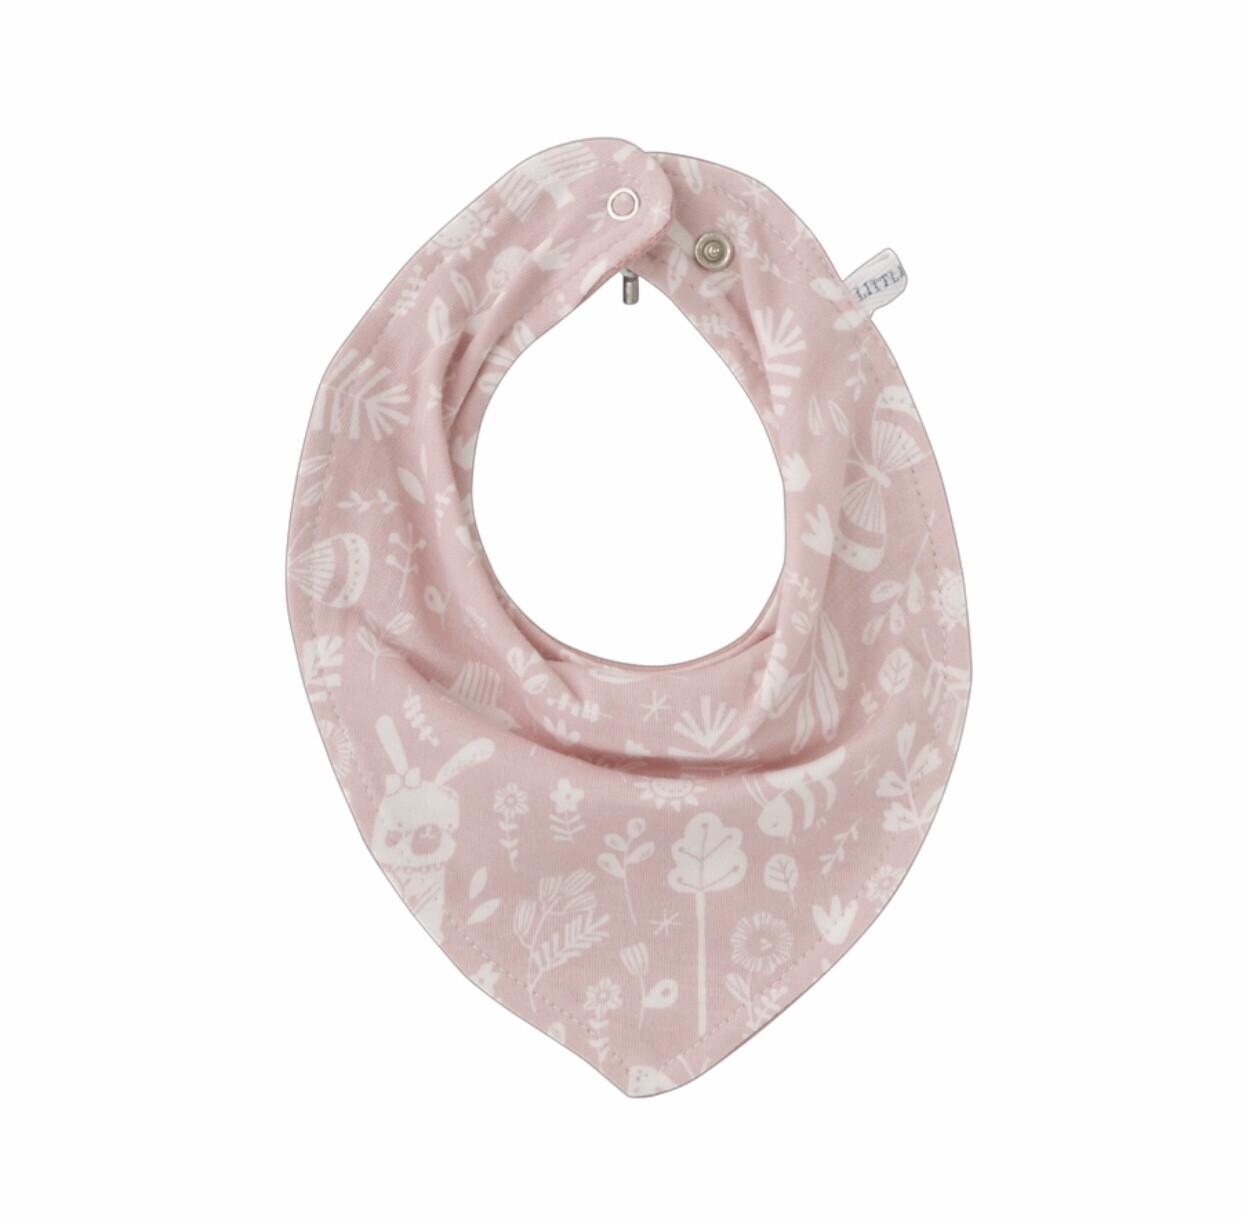 Bandana Halstuch Hasenmuster  rosa